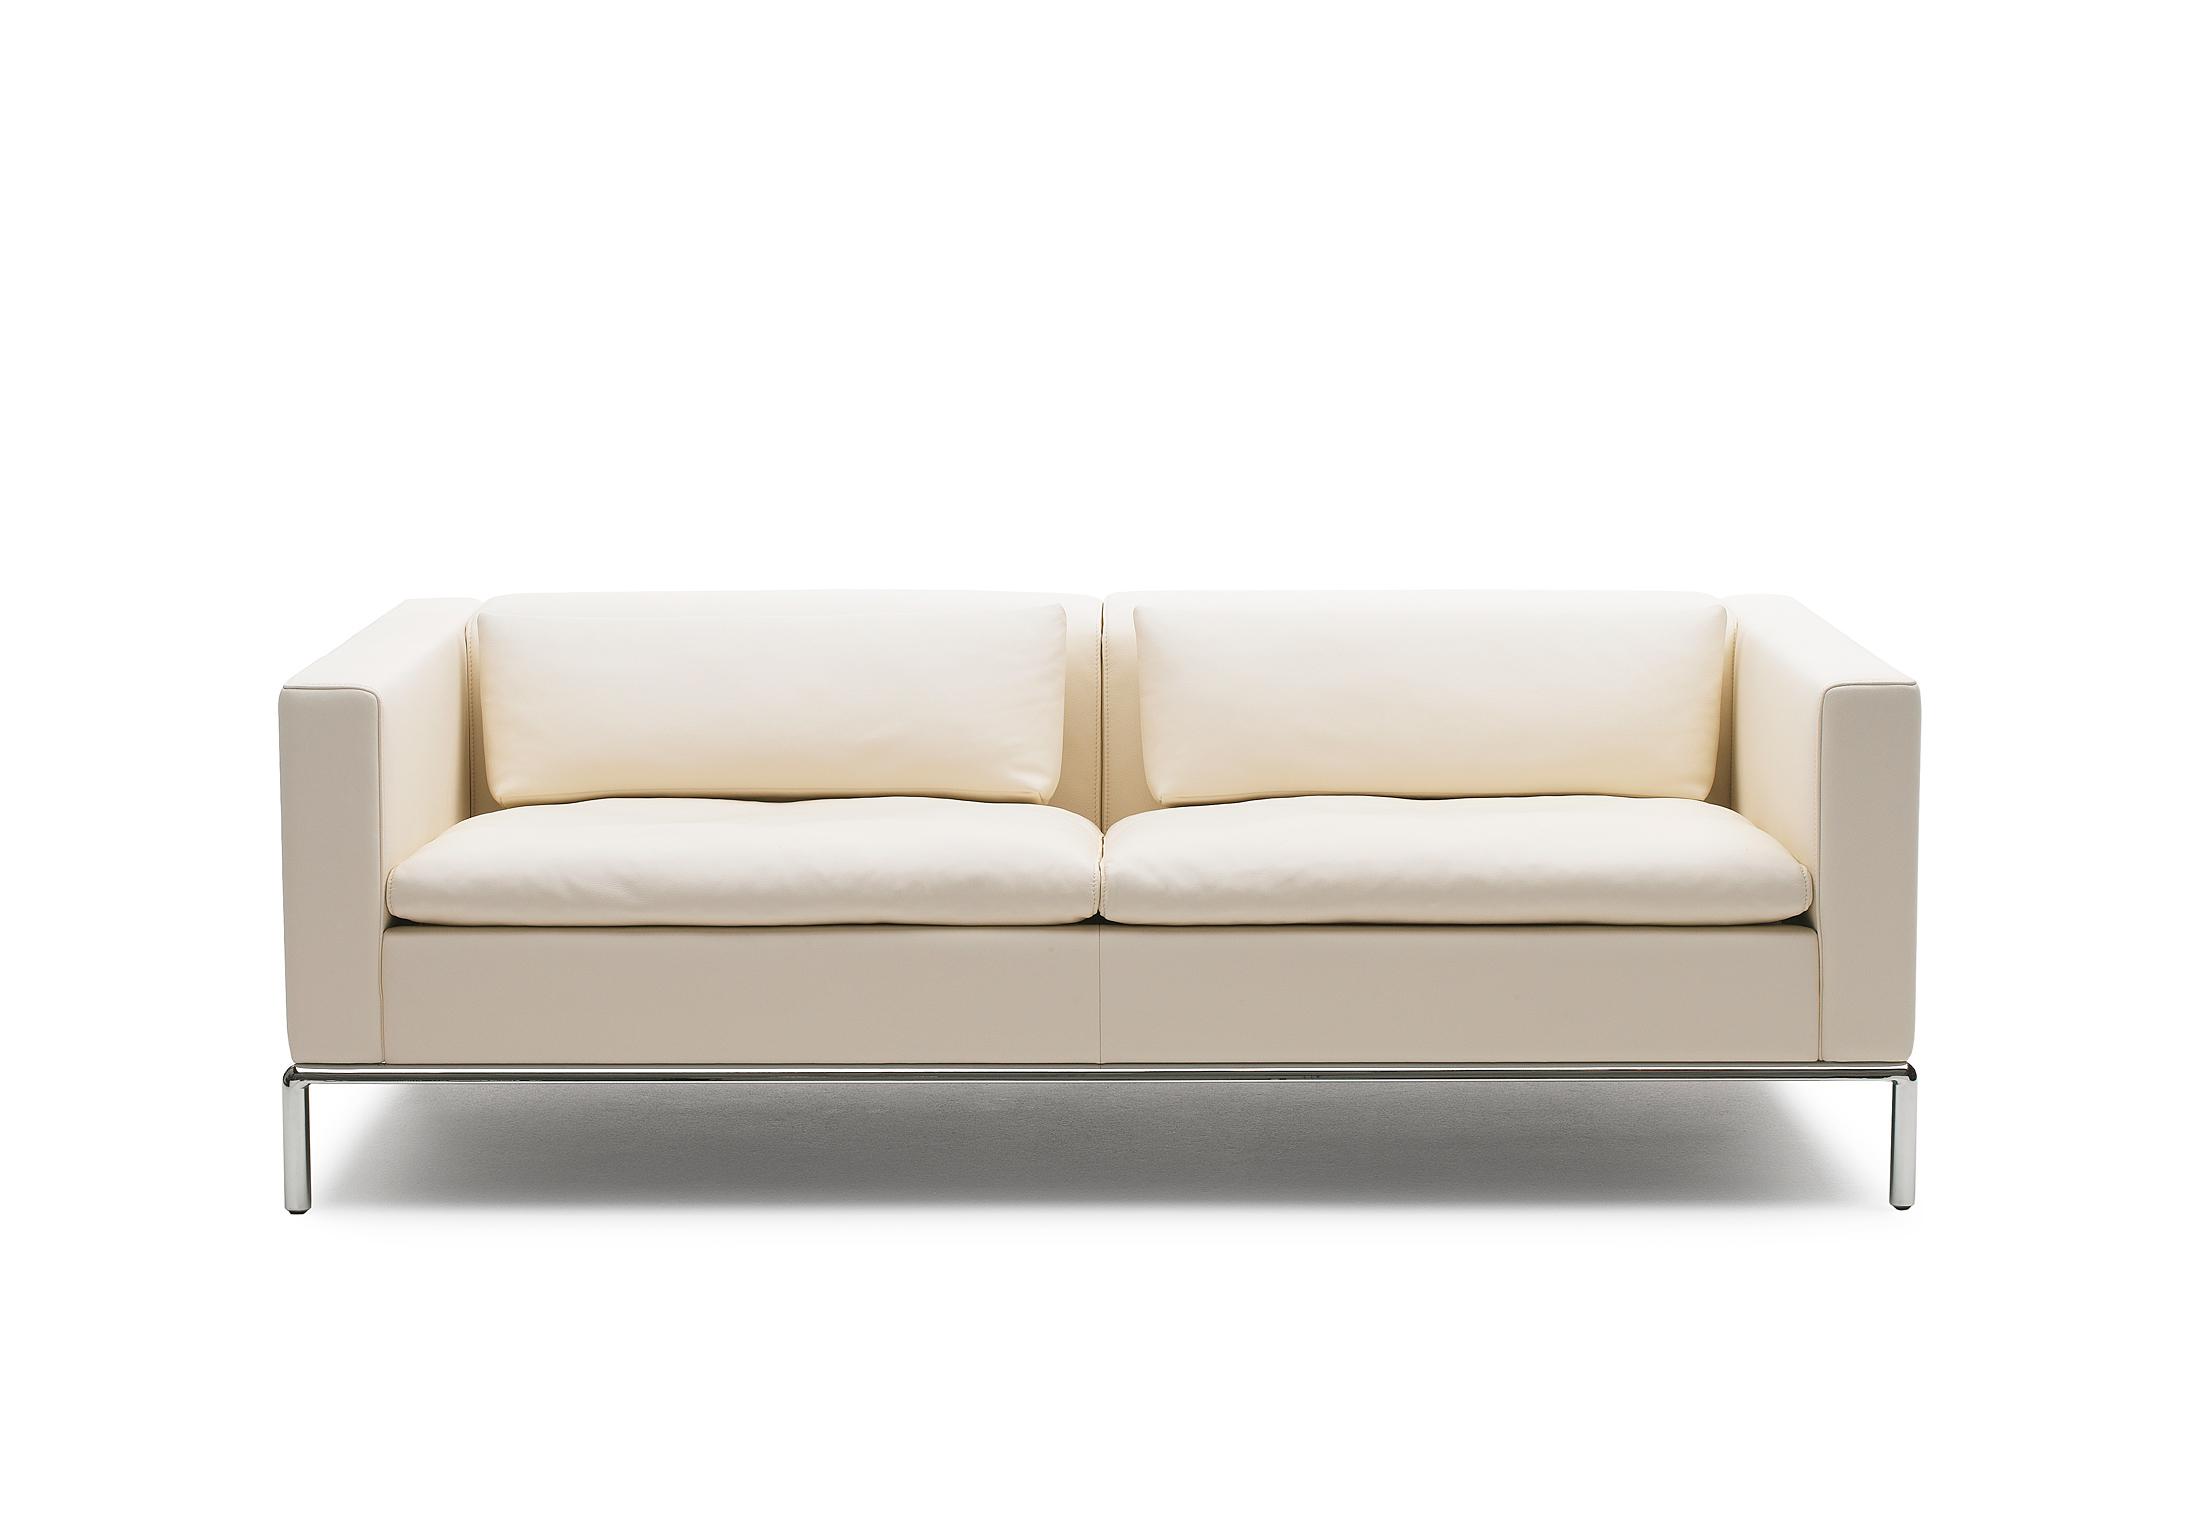 Full Size of De Sede Sessel Gebraucht Kaufen Endless Sofa Ds 600 Bi Outlet 47 Preisliste Bed Usa Furniture For Sale Sleeper By Used Preis Garnitur 2 Teilig Home Affair Sofa De Sede Sofa